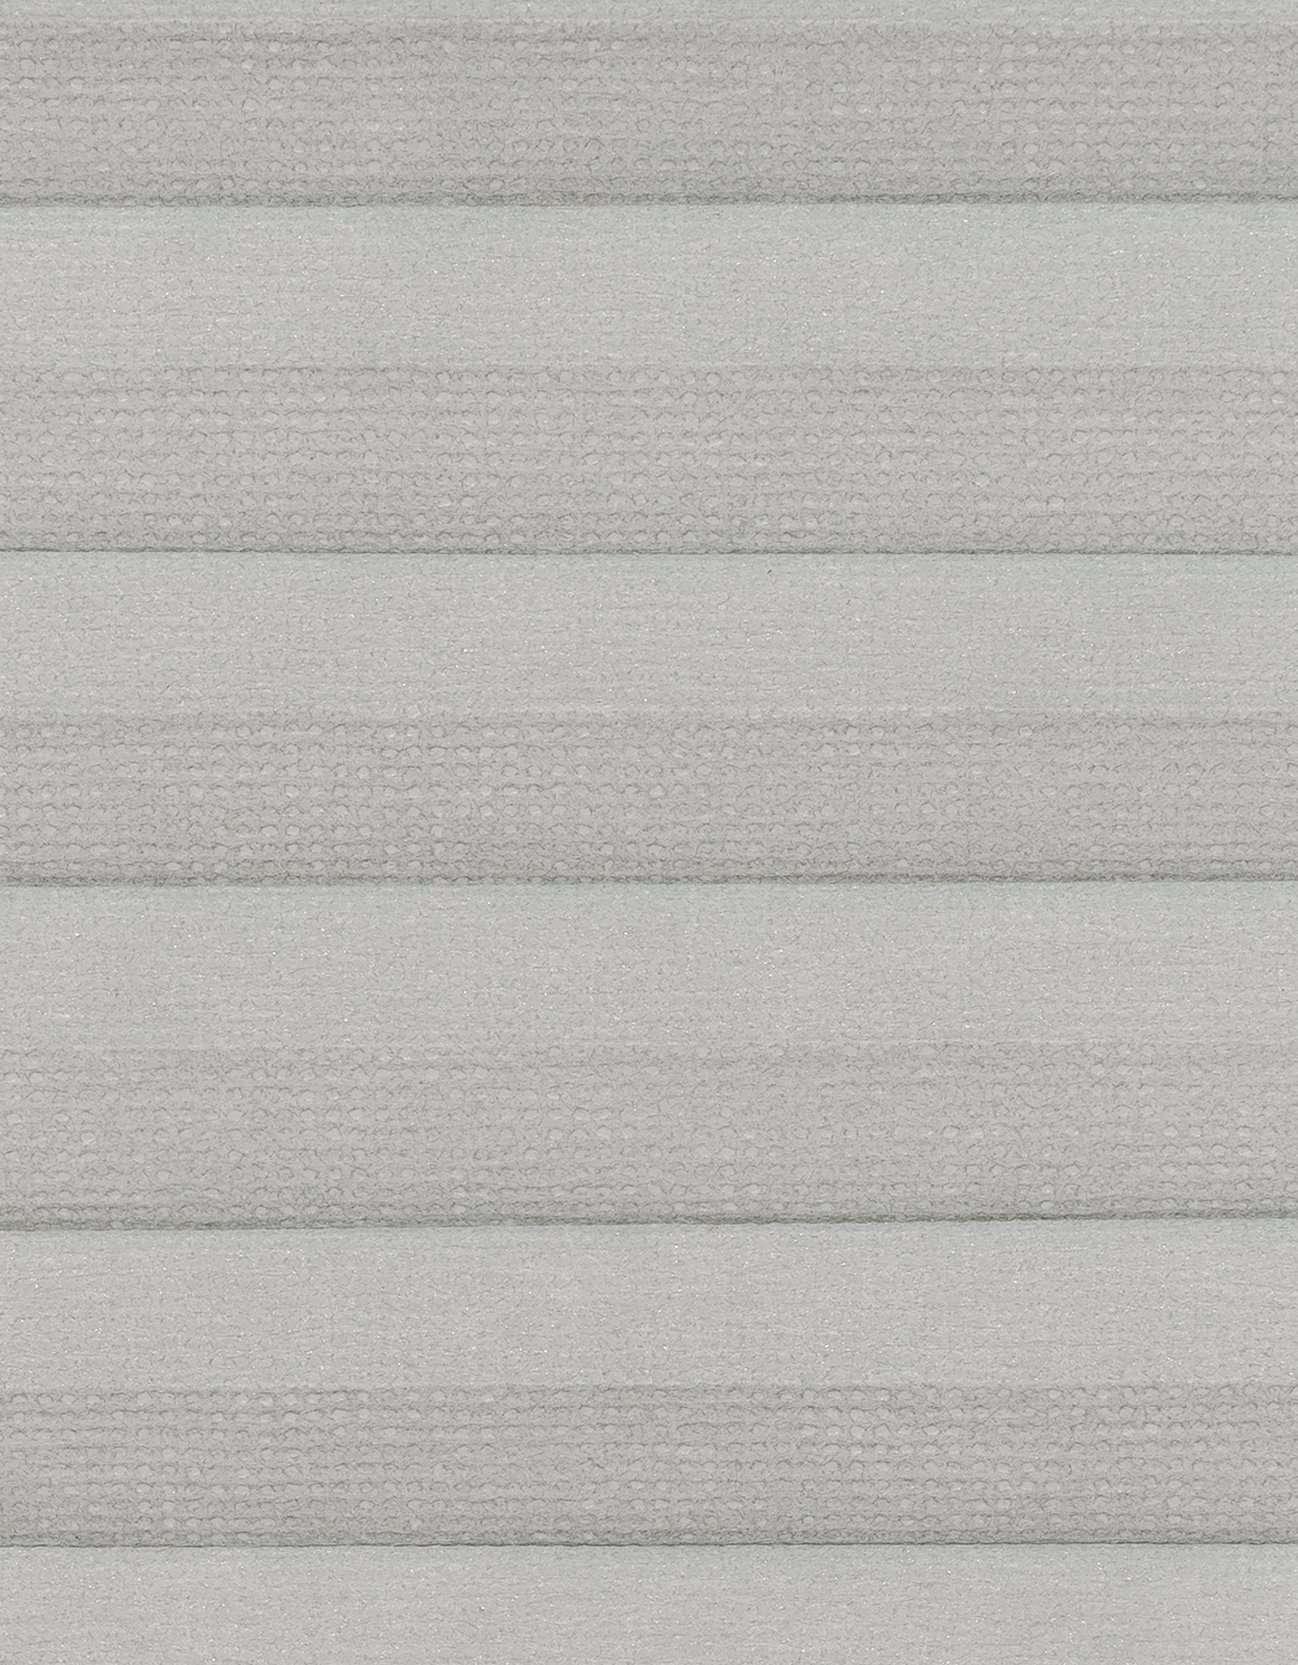 Semi-transparant Dupligordijnen 25 mm Kleurstaal Wolk